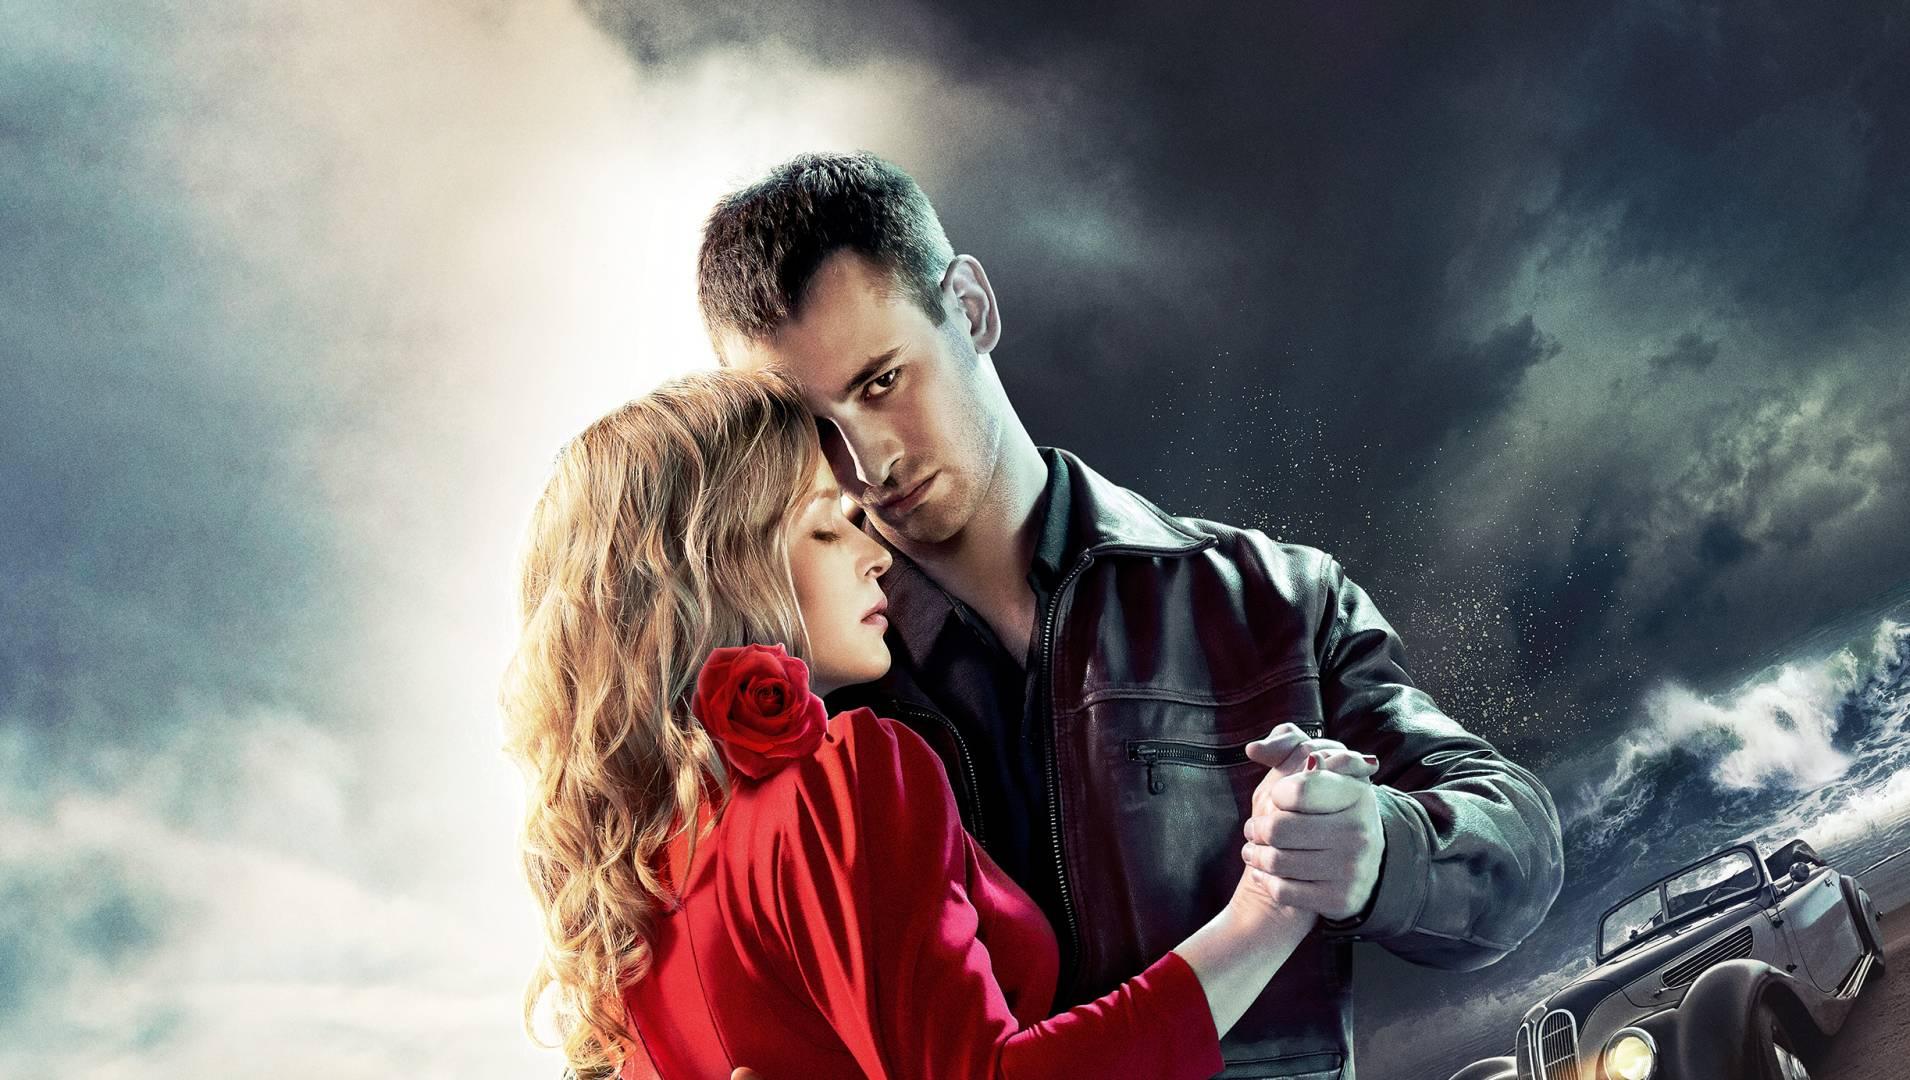 Холодное танго - Драма, Фильм